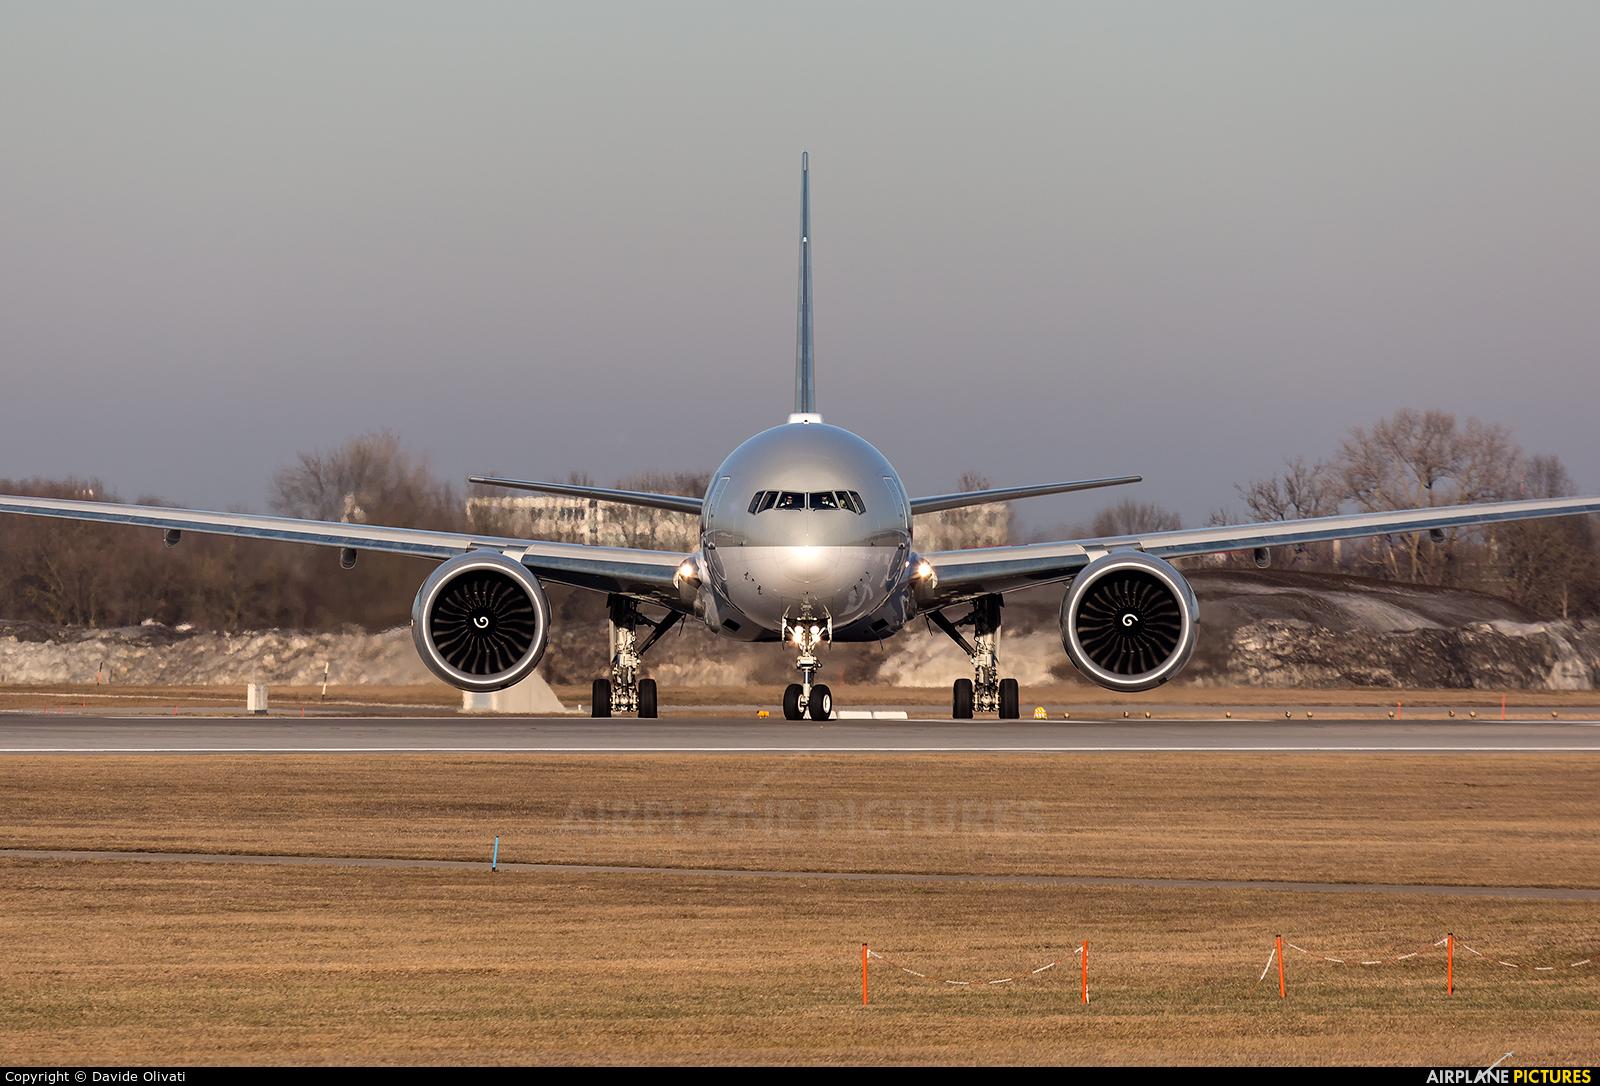 Qatar Airways A7-BEL aircraft at Munich